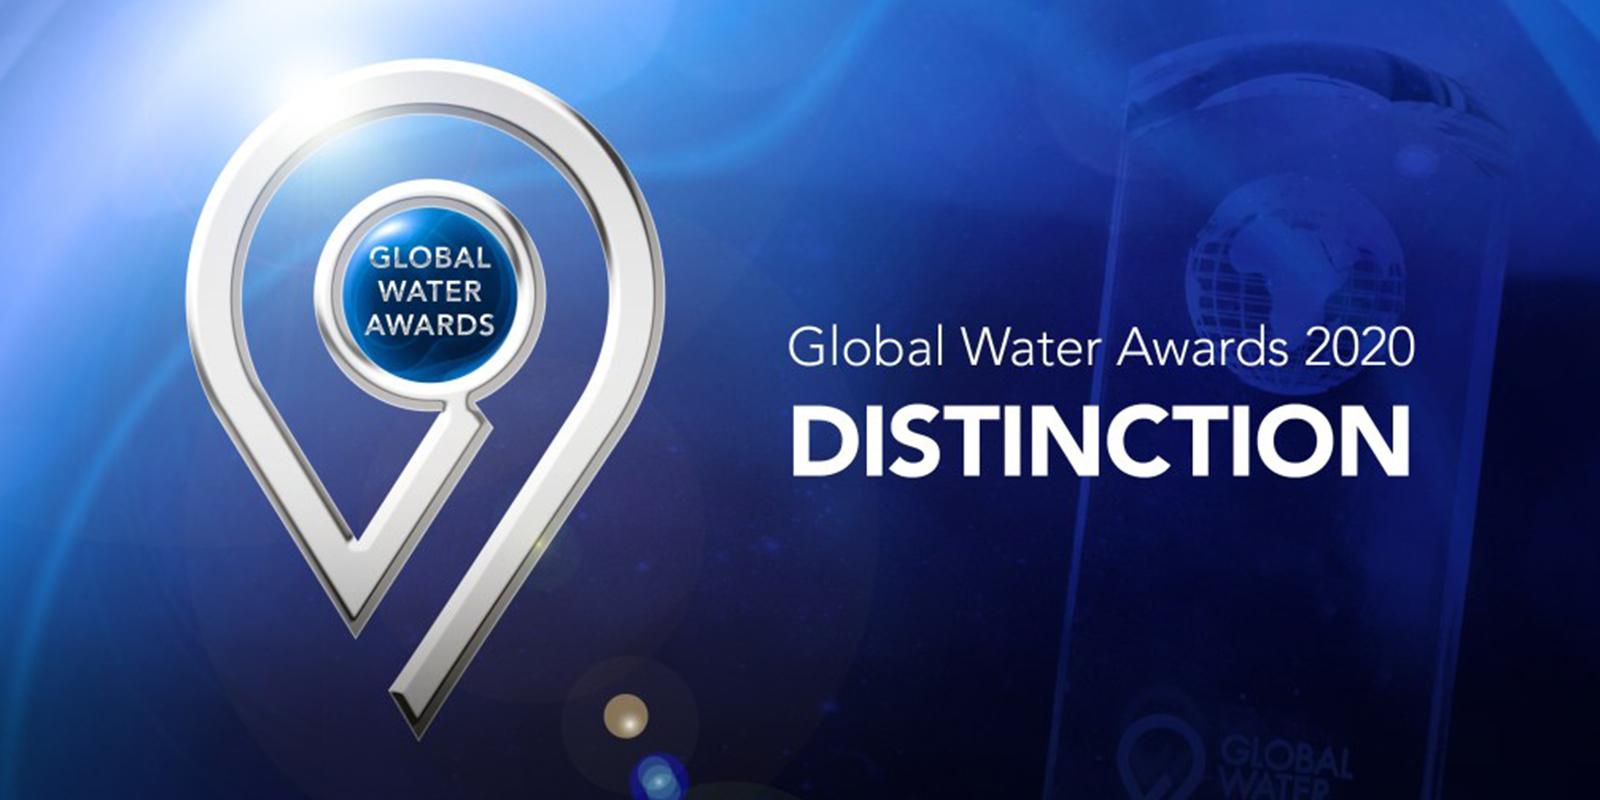 Premios Global Water Awards 2020